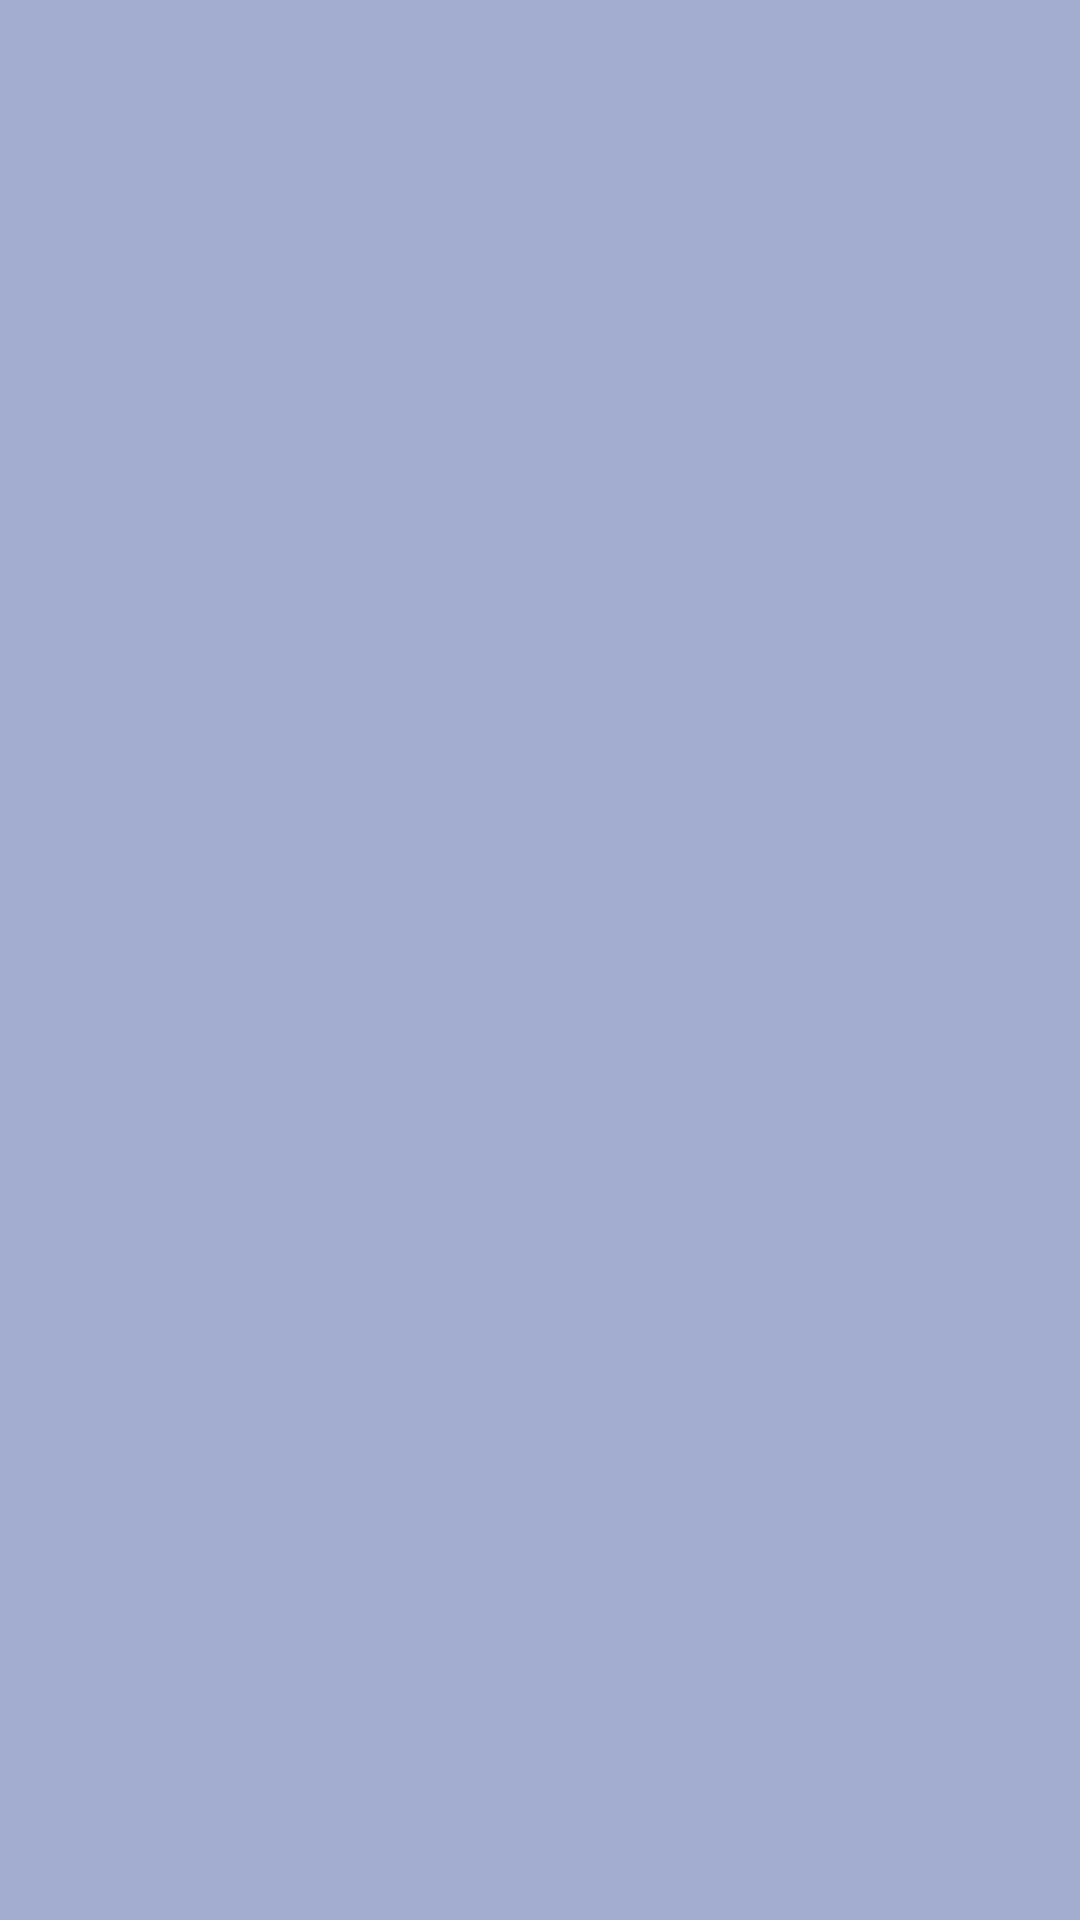 1080x1920 Wild Blue Yonder Solid Color Background